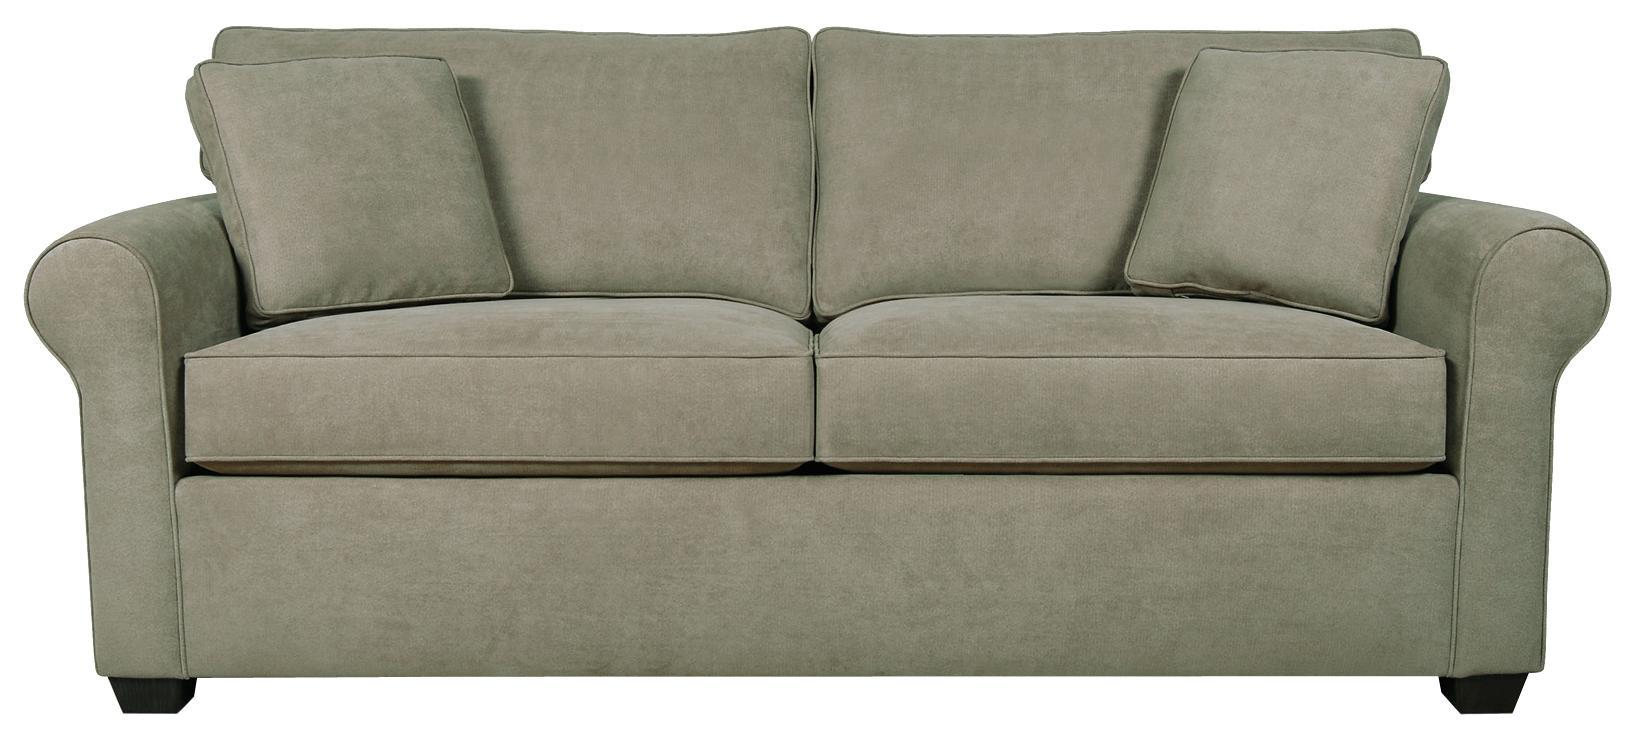 England Seabury Visco Mattress Queen Size Sofa Sleeper